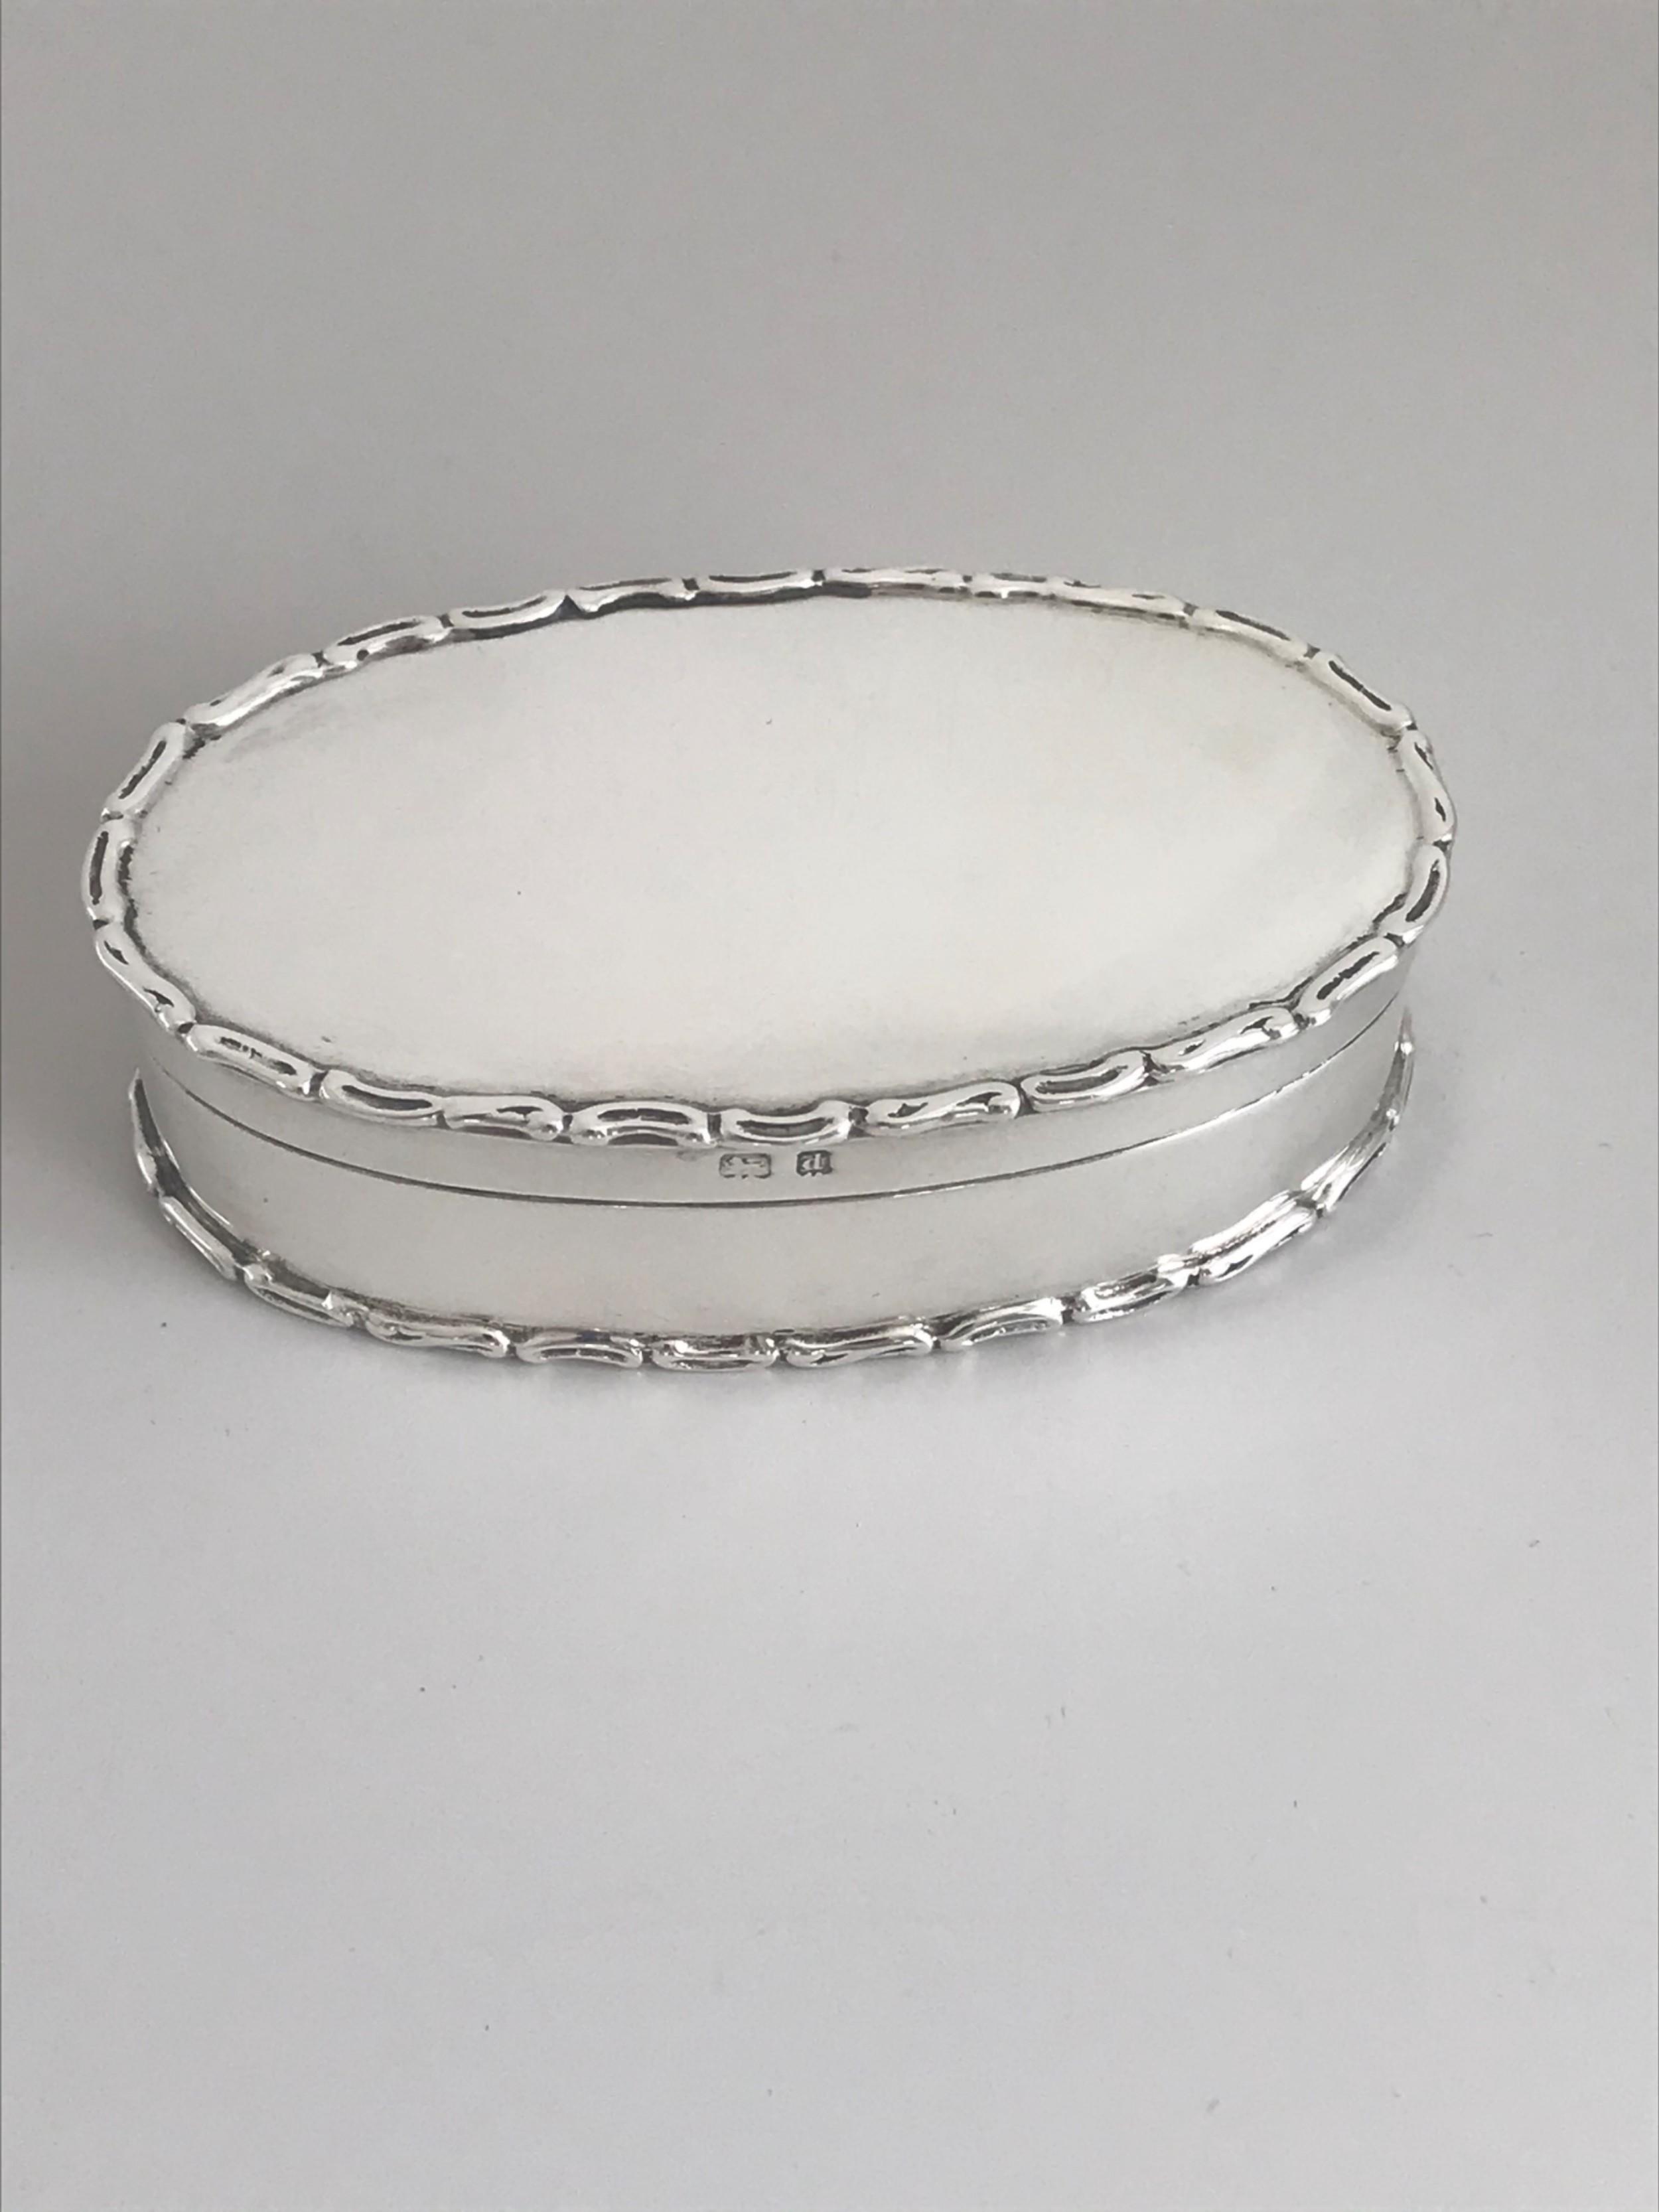 silver oval trinket box birmingham 1903